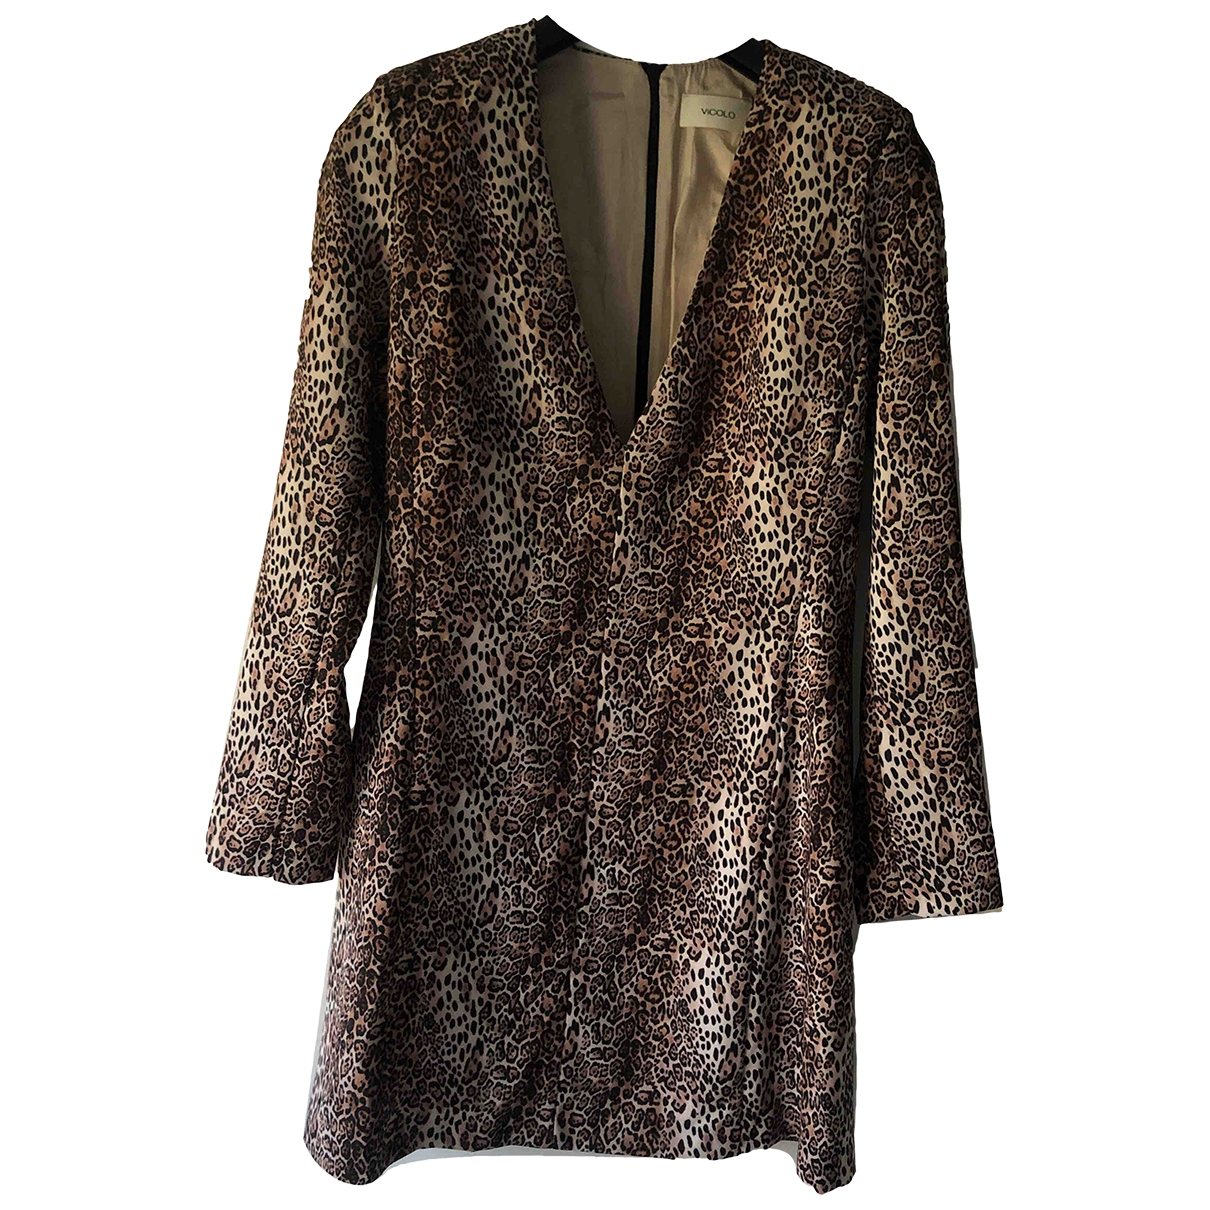 Vicolo \N dress for Women S International